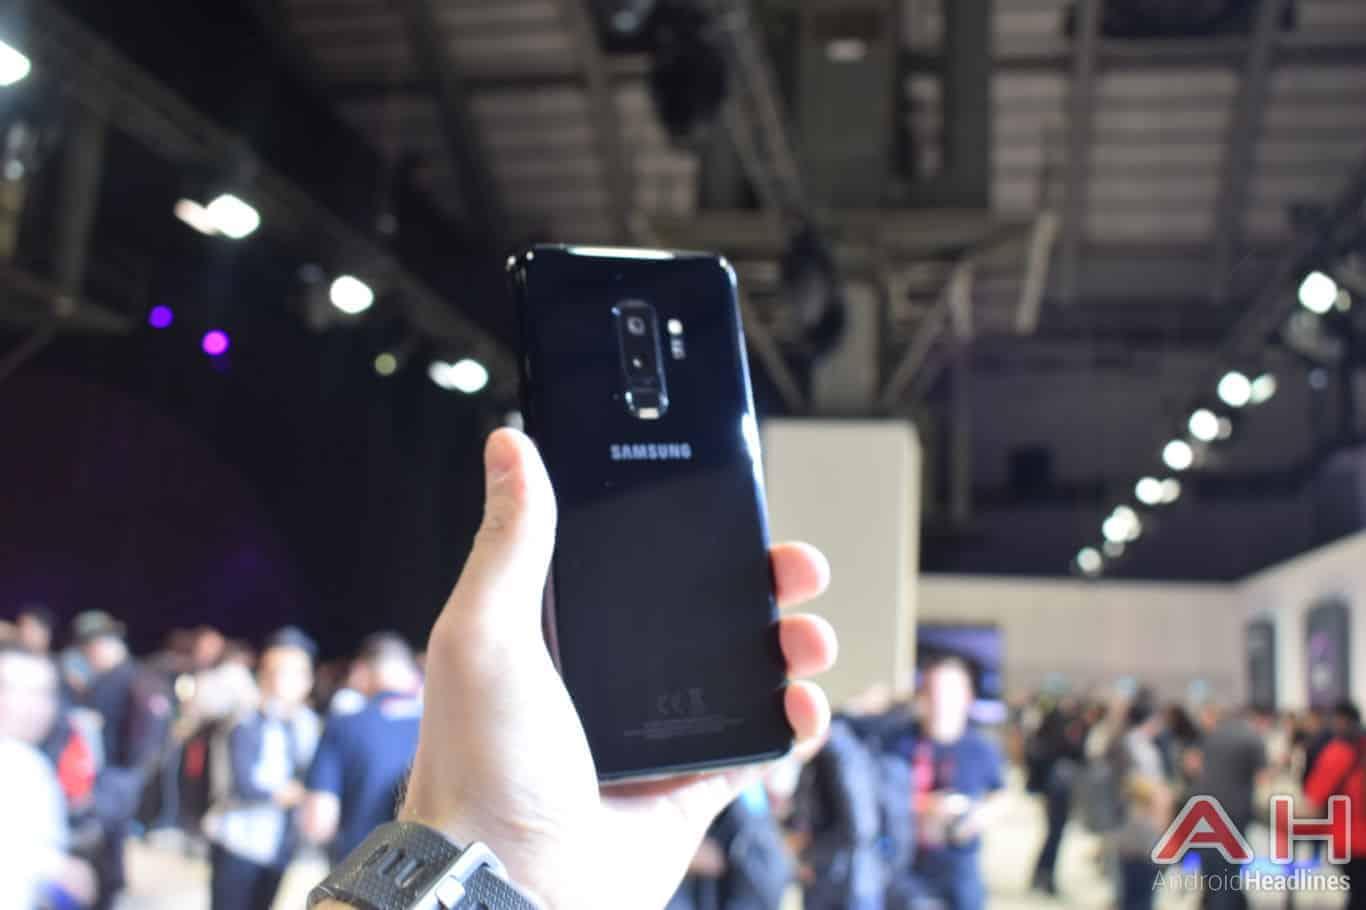 Samsung Galaxy S9 Plus Hands On AH 1